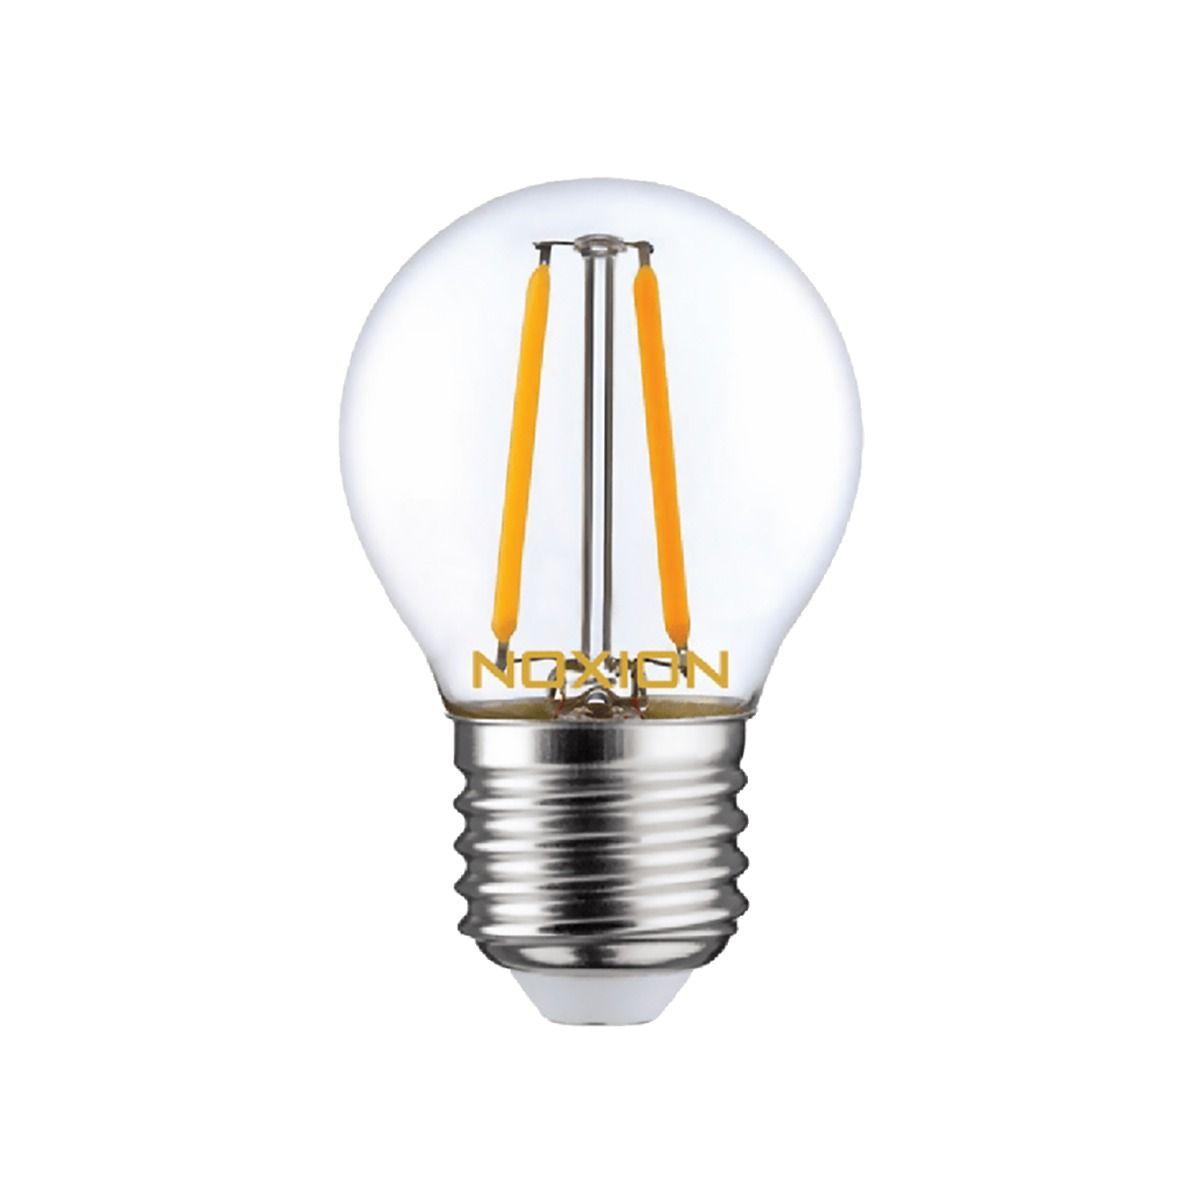 Noxion Lucent LED Lustre E27 2.5W 827 Fadenlampe | Dimmbar - Ersatz für 25W